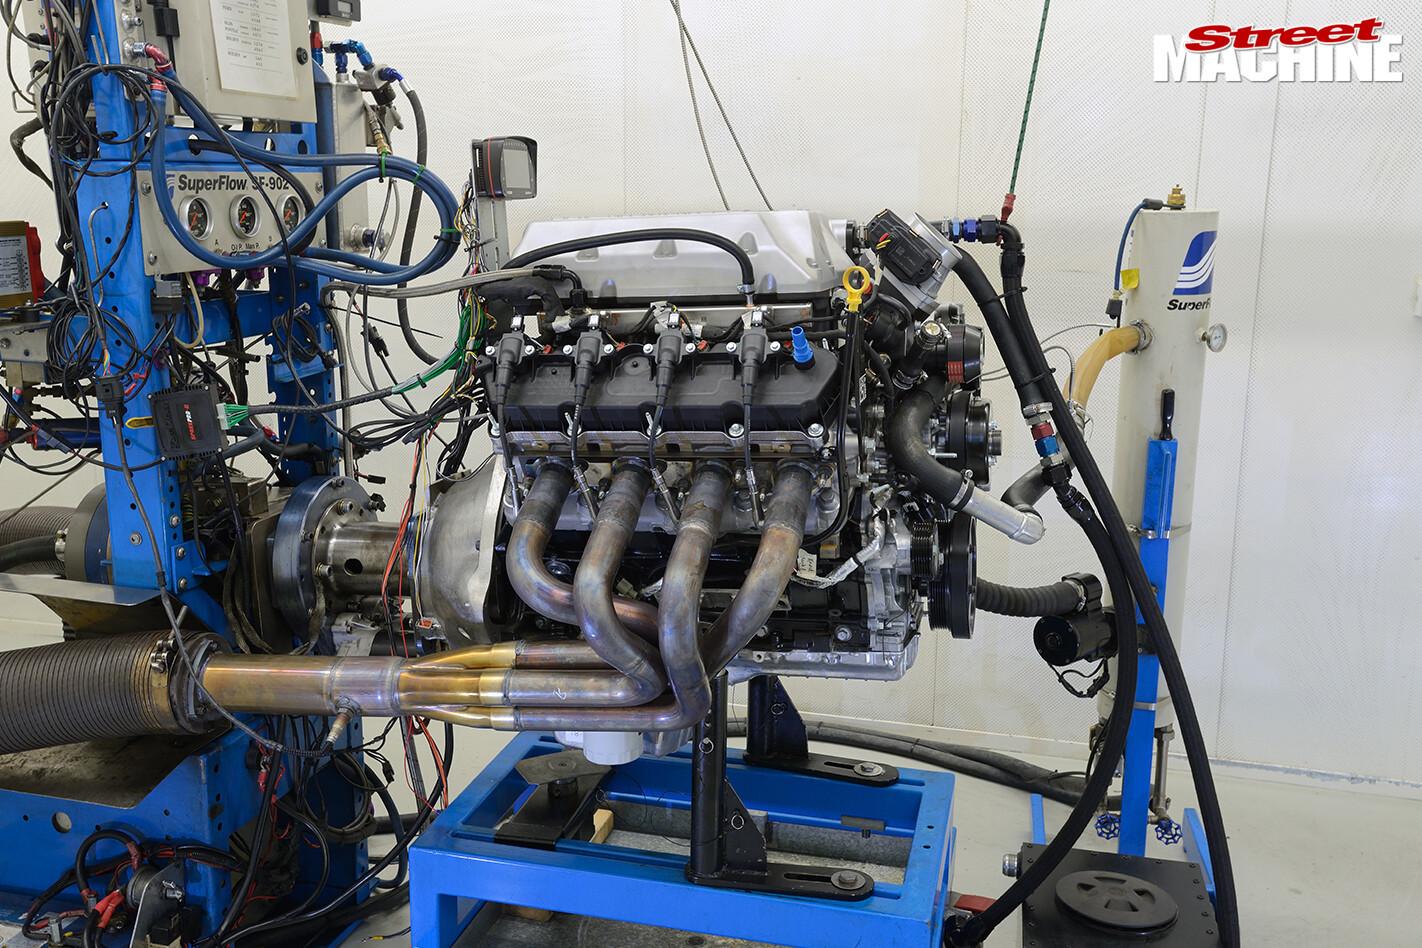 Street Machine TV Ford Godzilla Engine Dyno 2